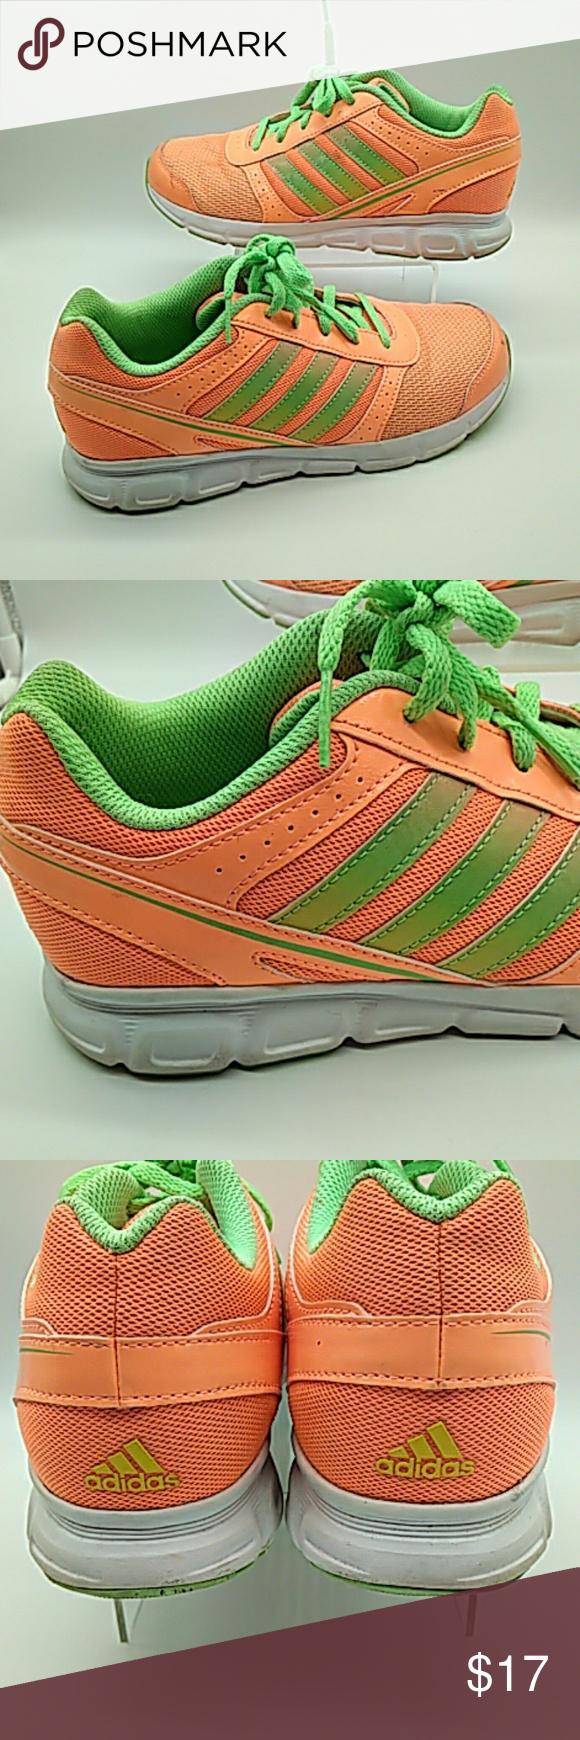 adidas ortholite orange